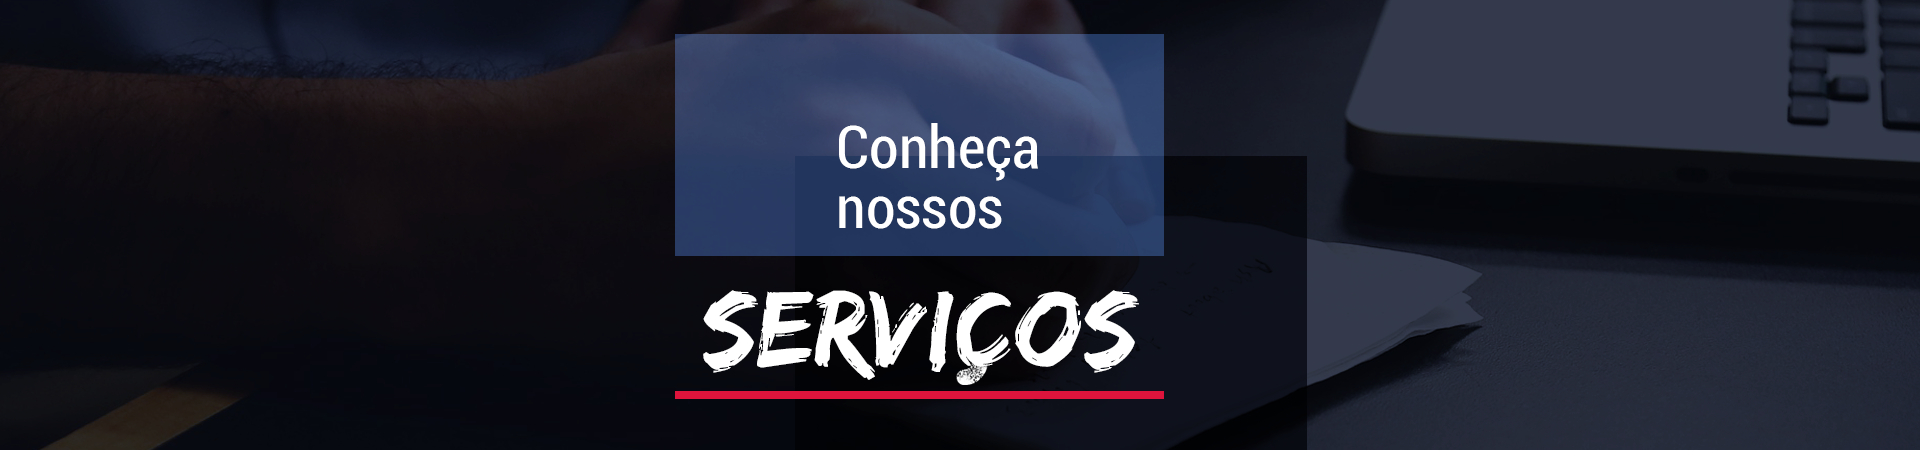 banner_servic%cc%a7os